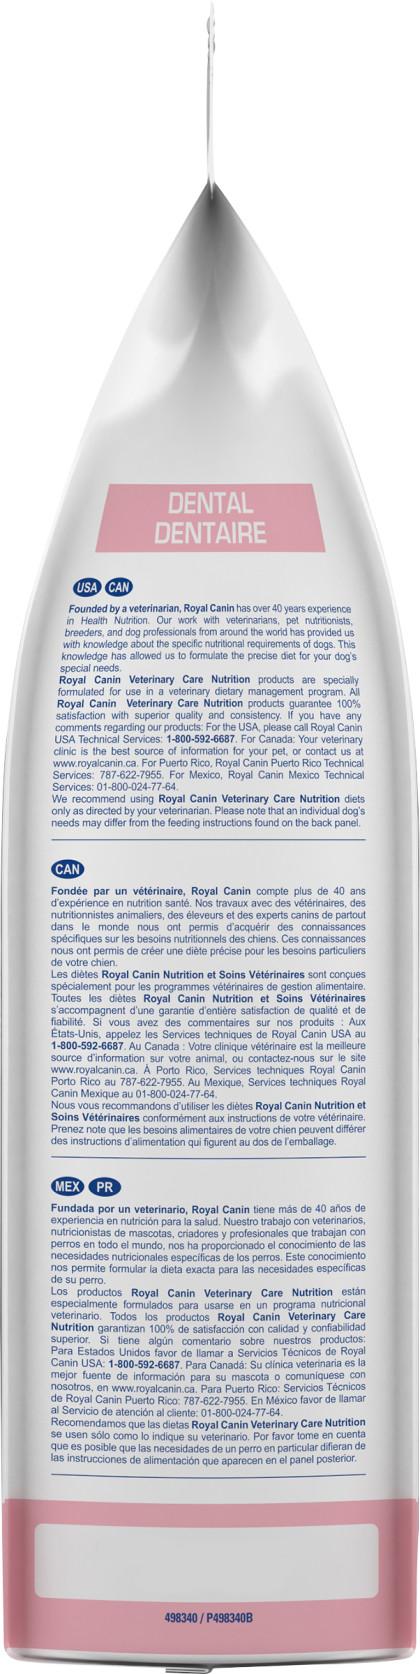 Royal Canin Veterinary Care Nutrition Canine Dental Dry Dog Food